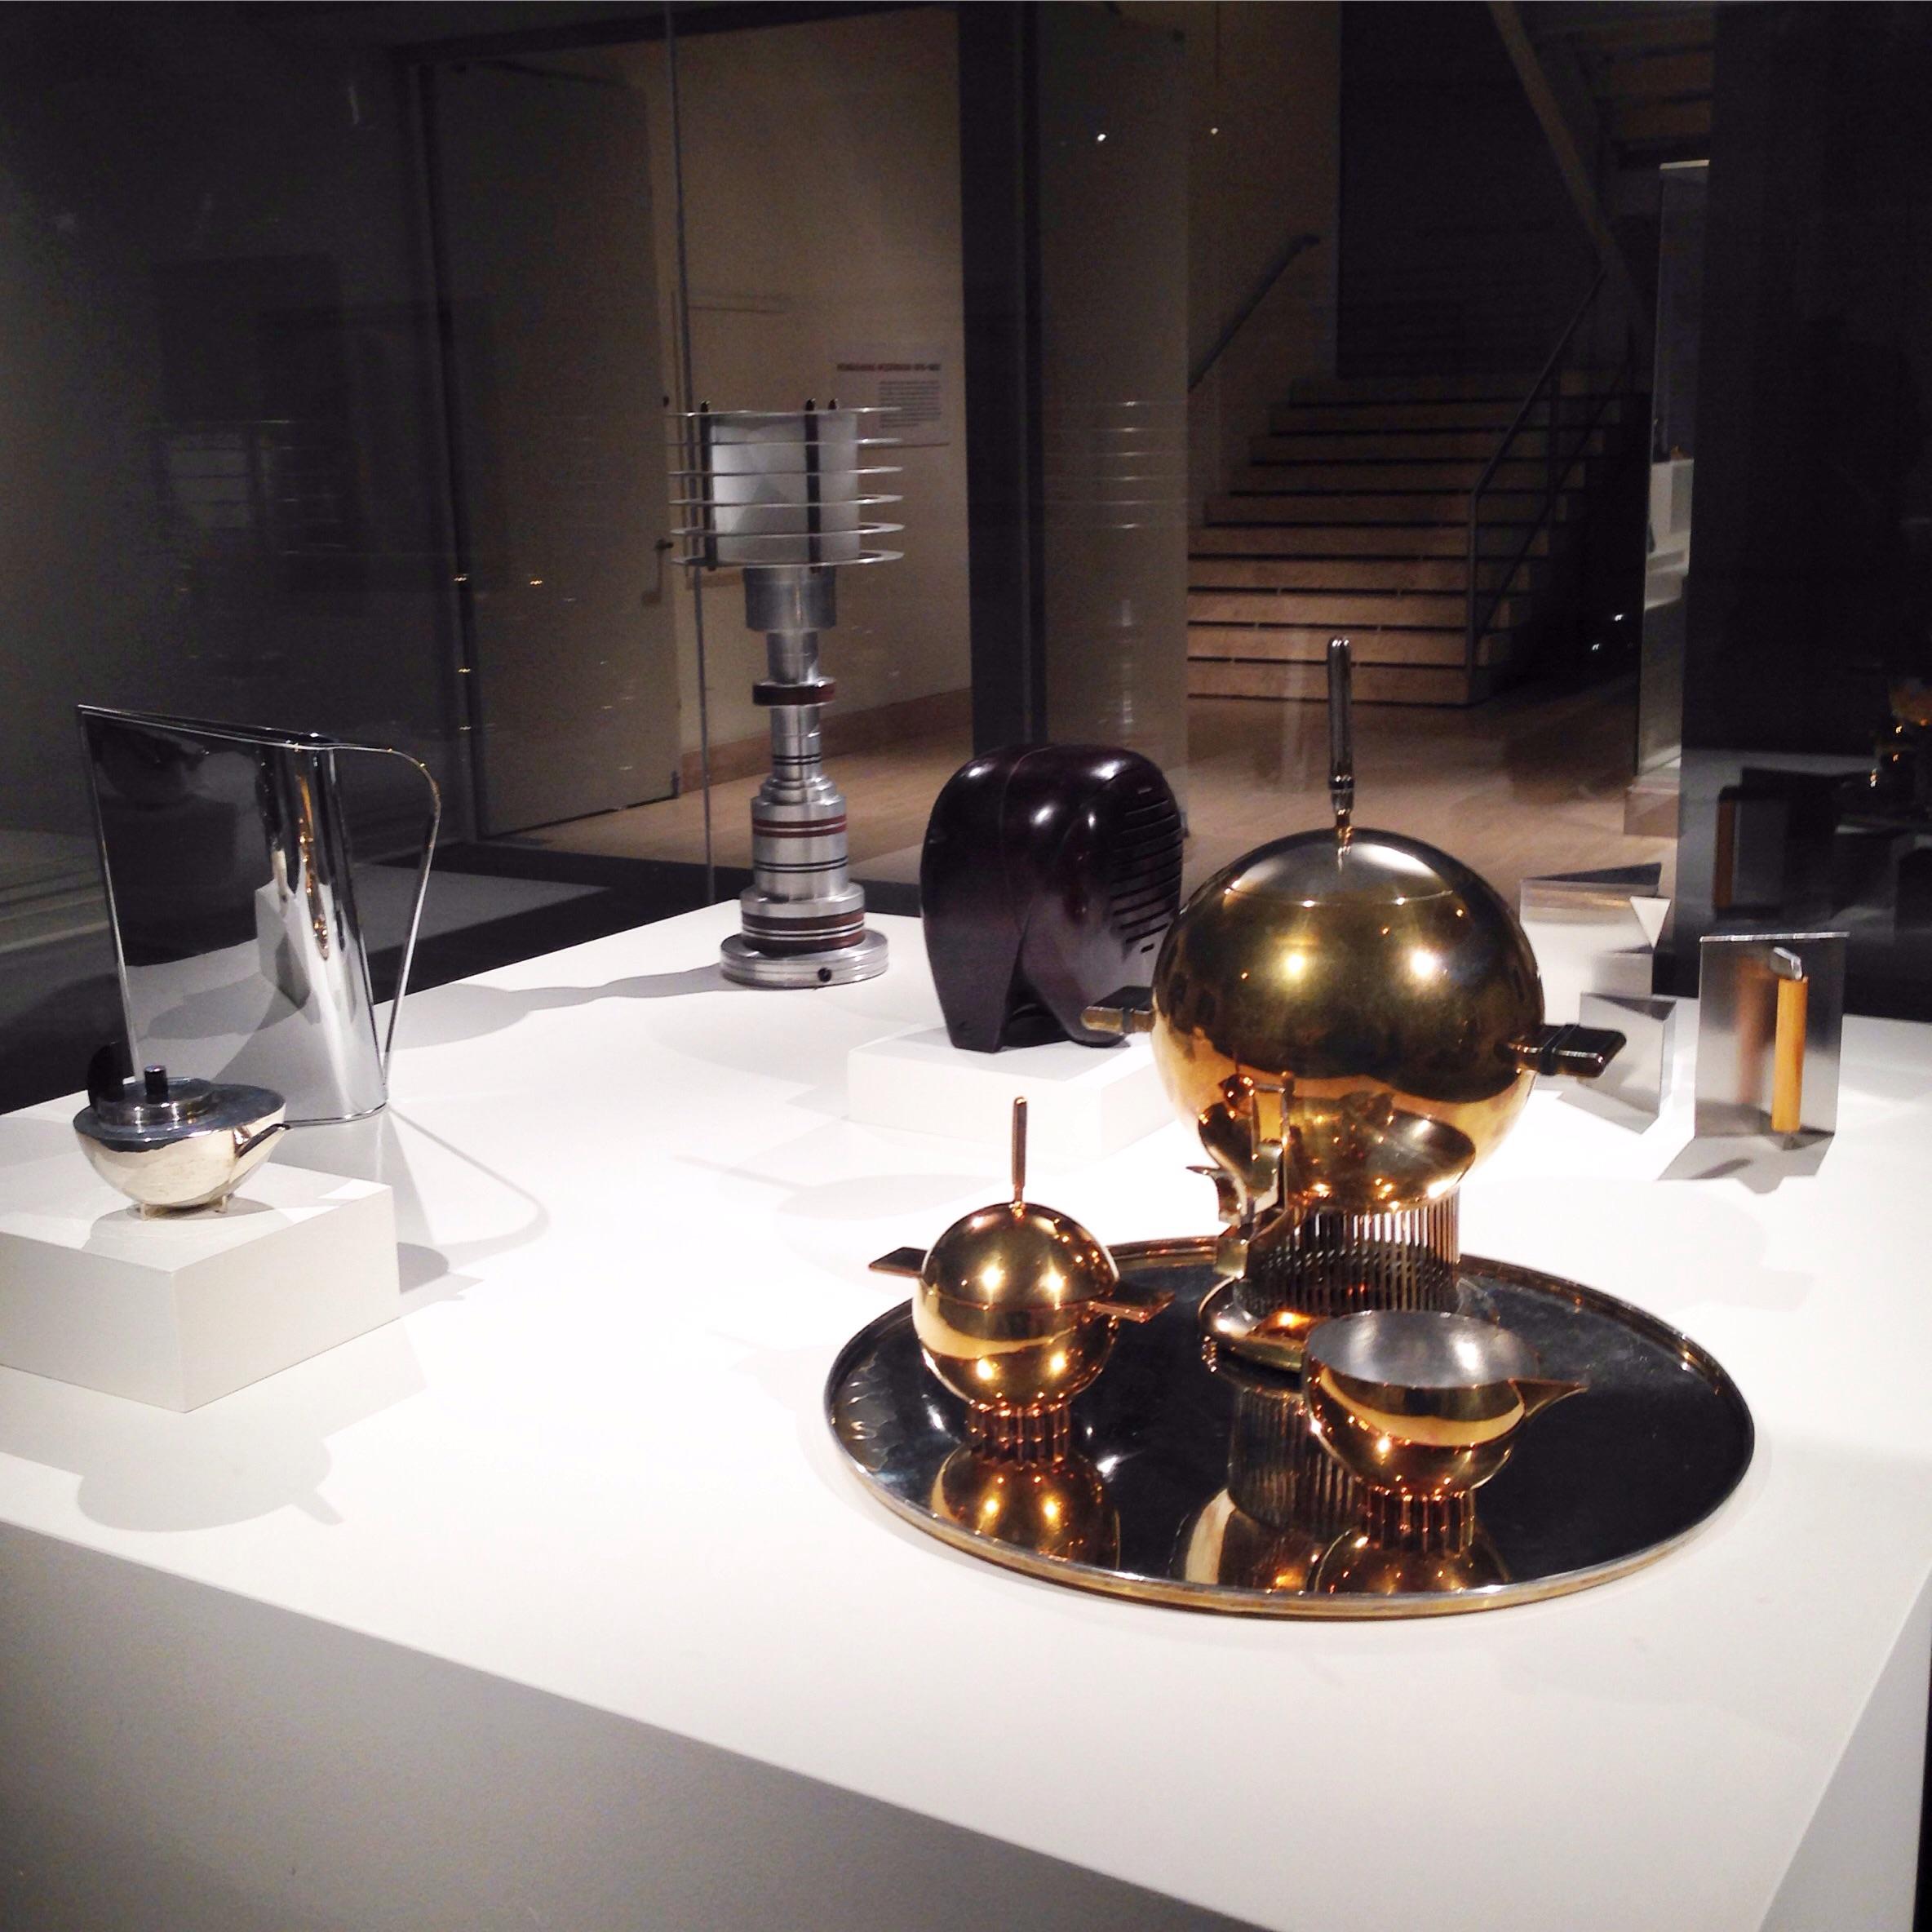 Contemporary, high polish table top adornments.